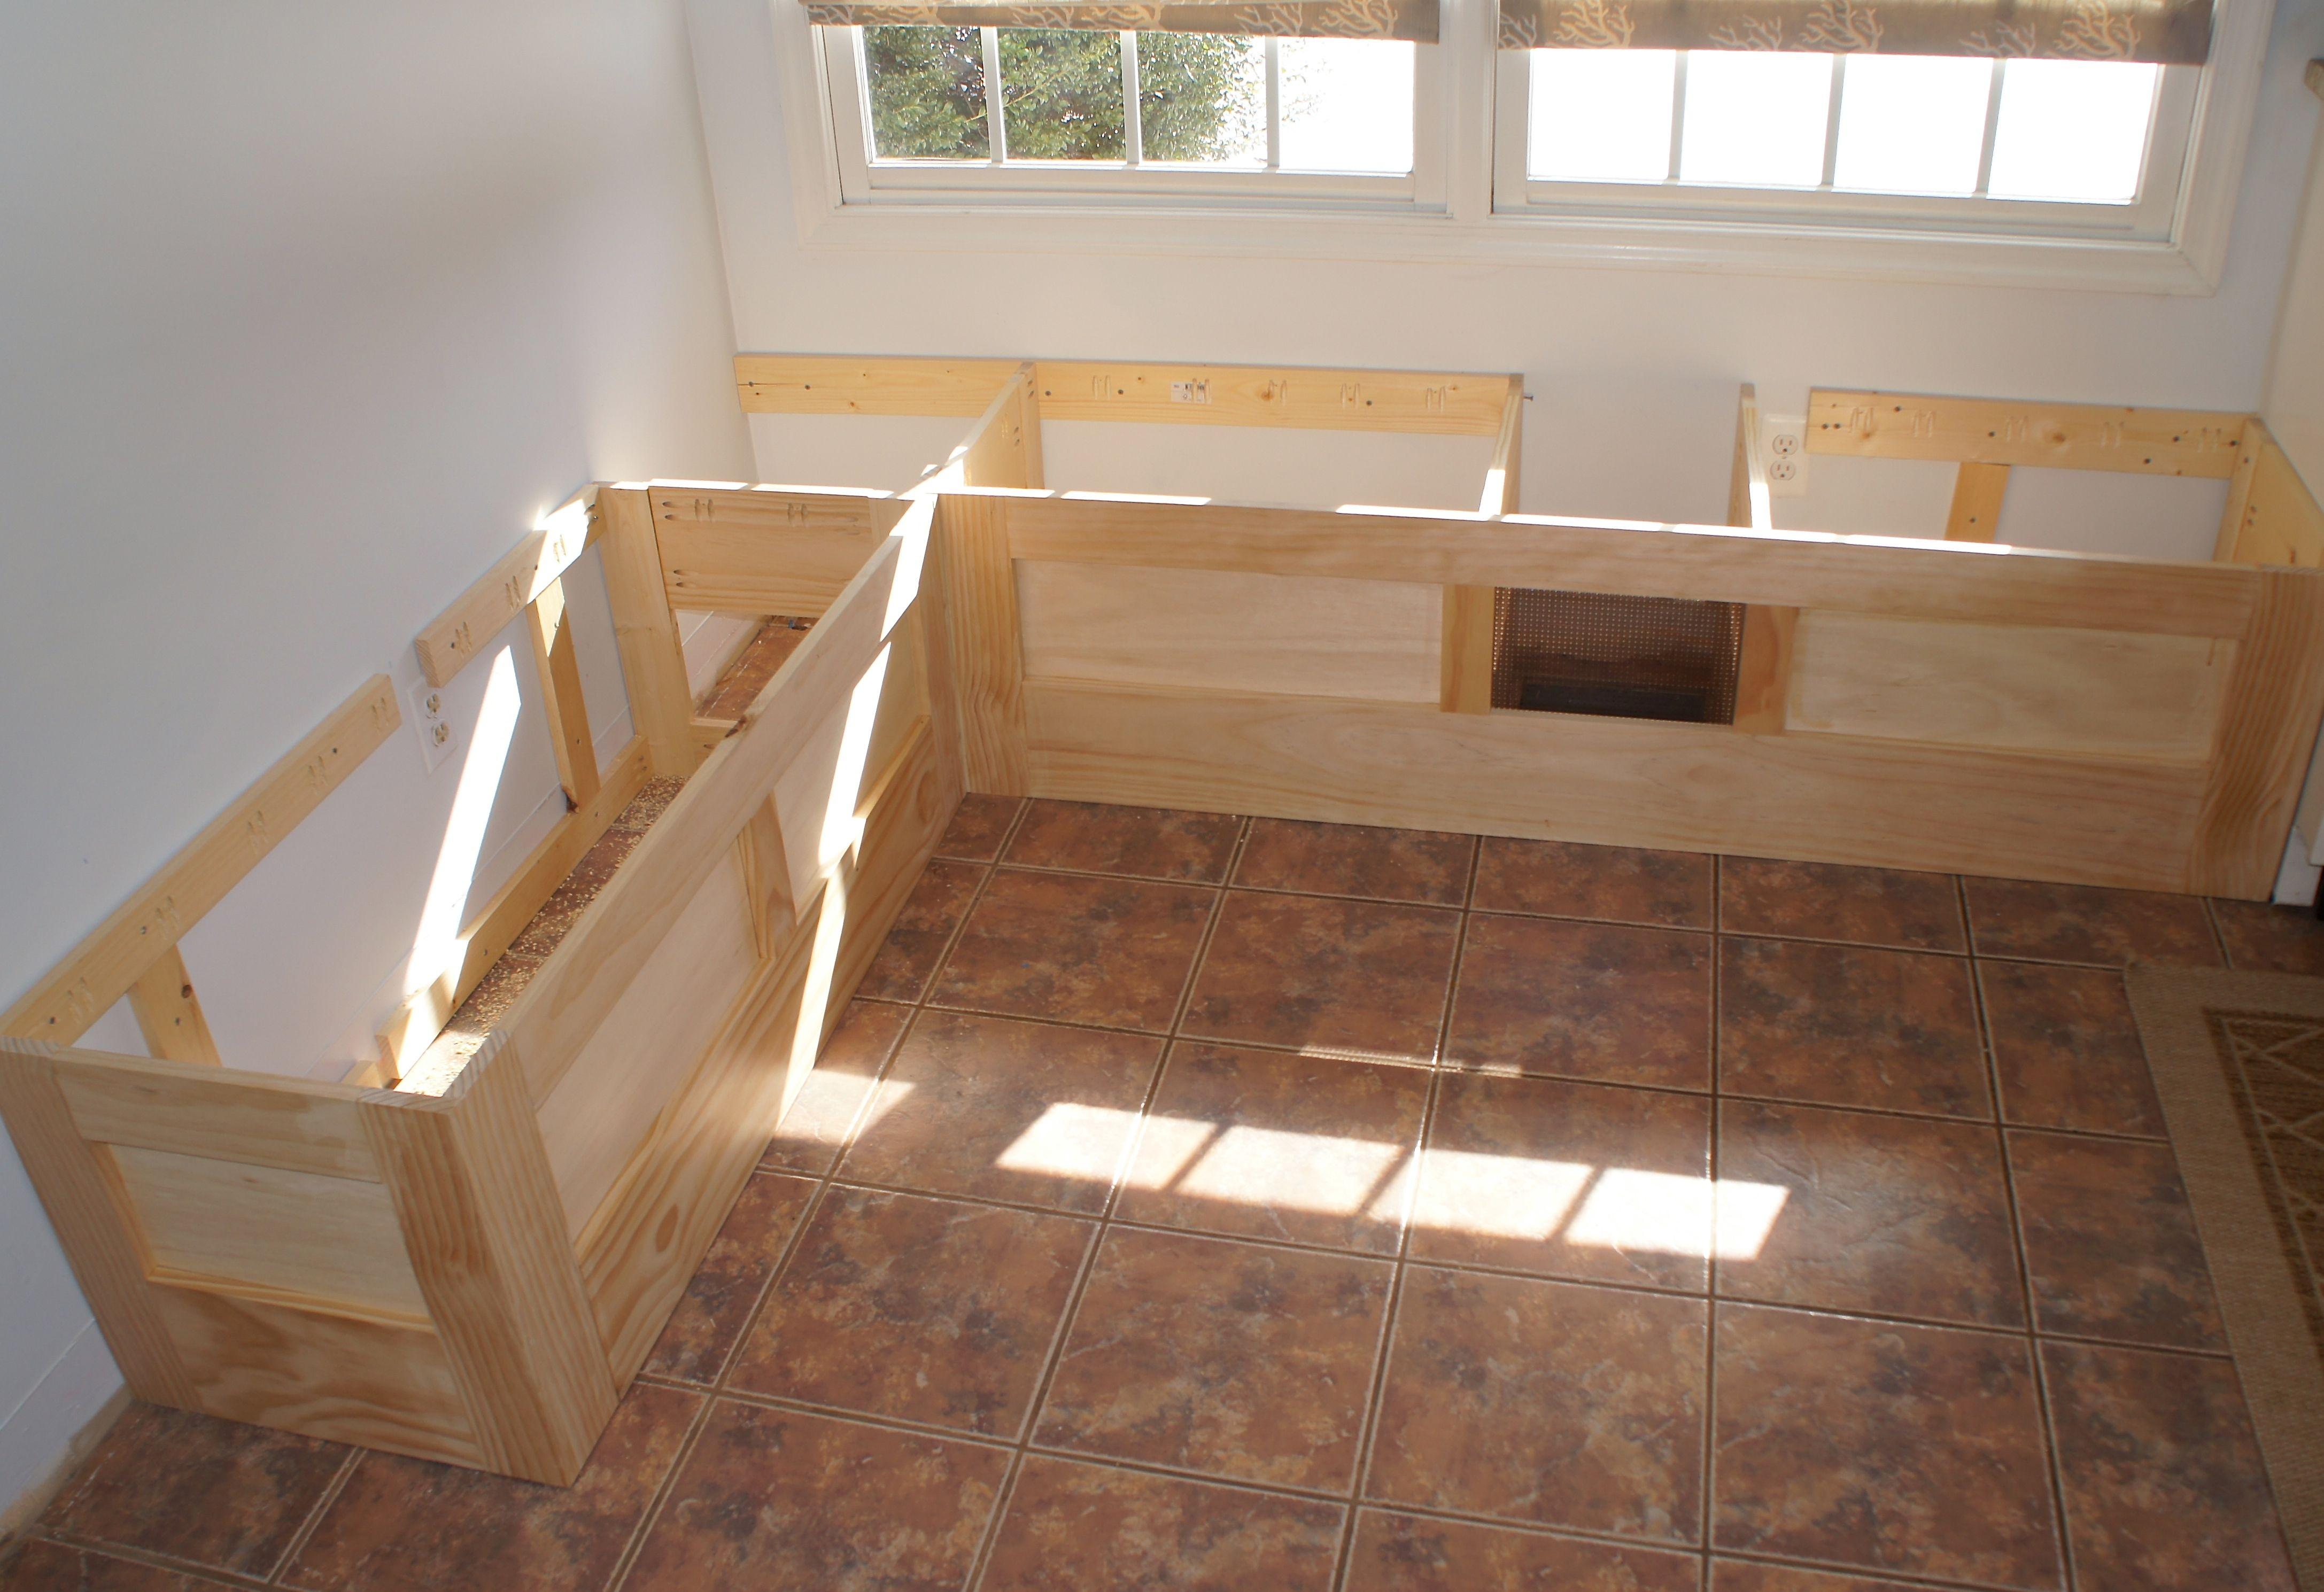 Kitchen Bench Seating With Storage Plans Diy storage bench